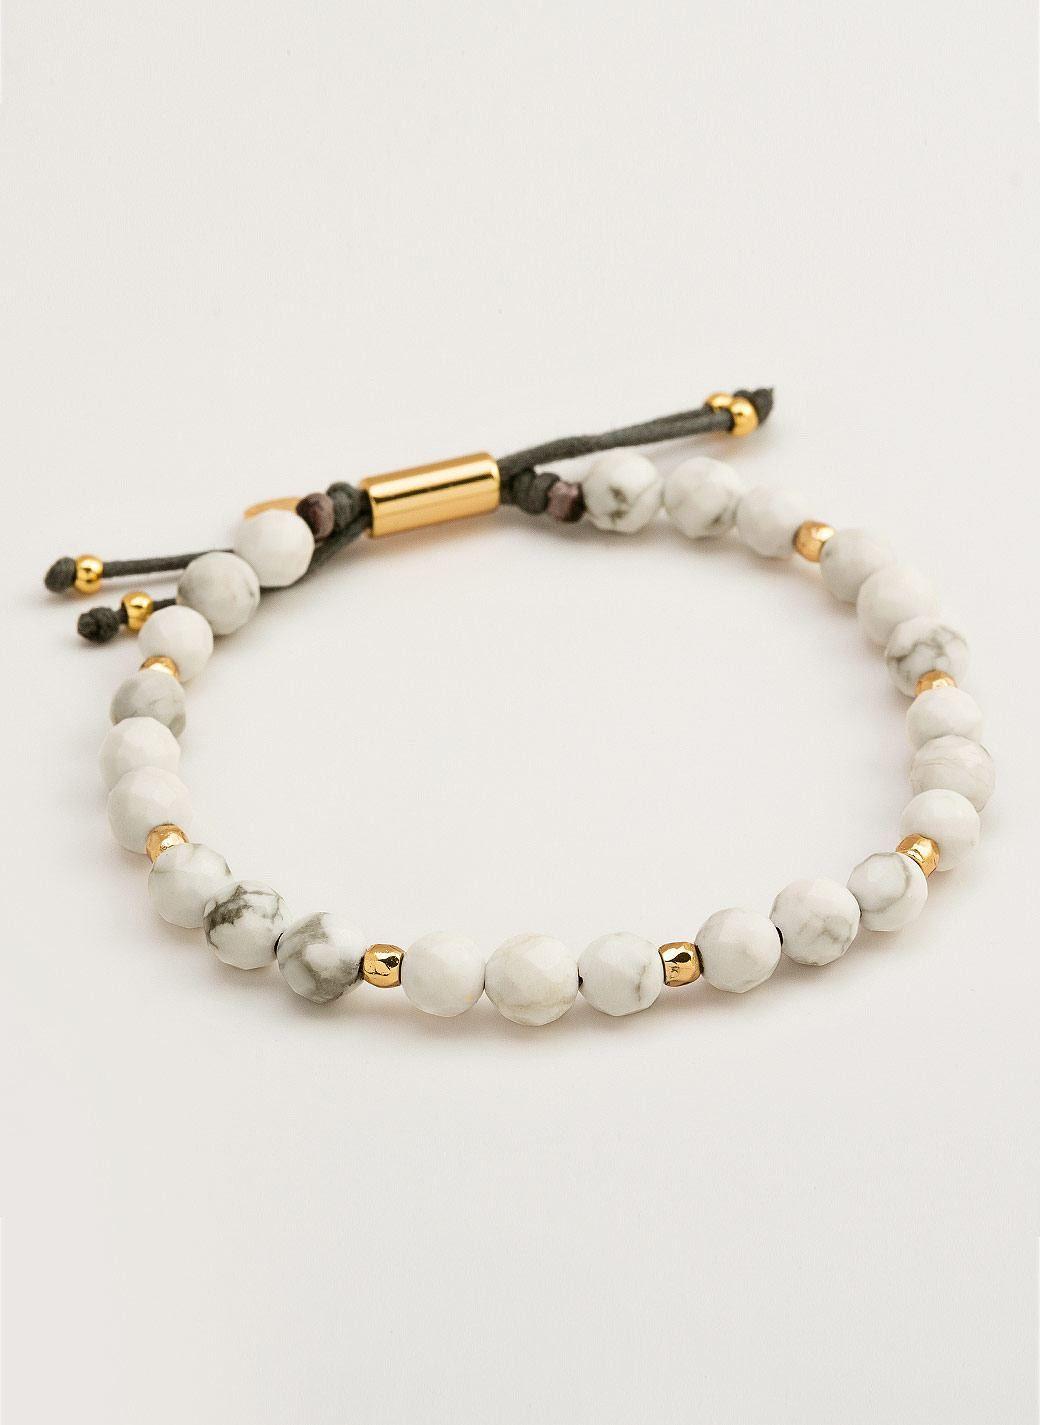 Power Gemstone Howlite Beaded Bracelet For Calming - Power Gemstones - All Jewelry